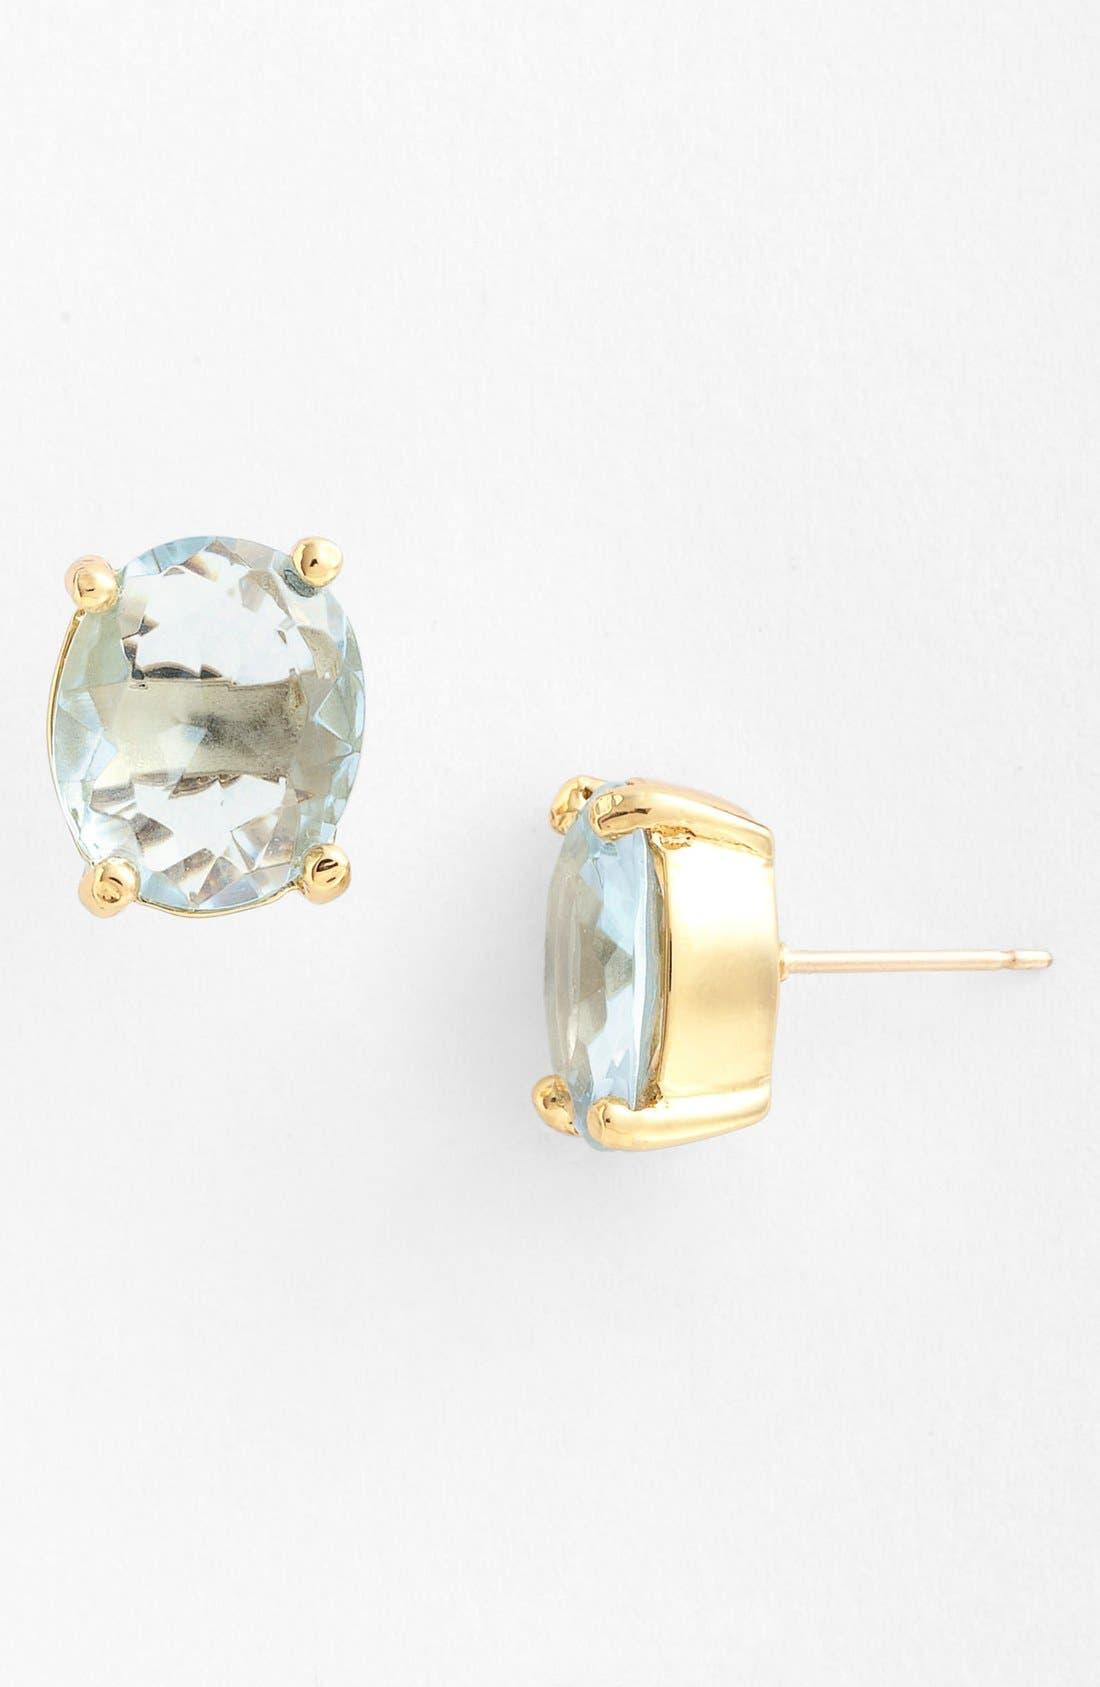 Alternate Image 1 Selected - kate spade new york oval stud earrings (Nordstrom Exclusive)